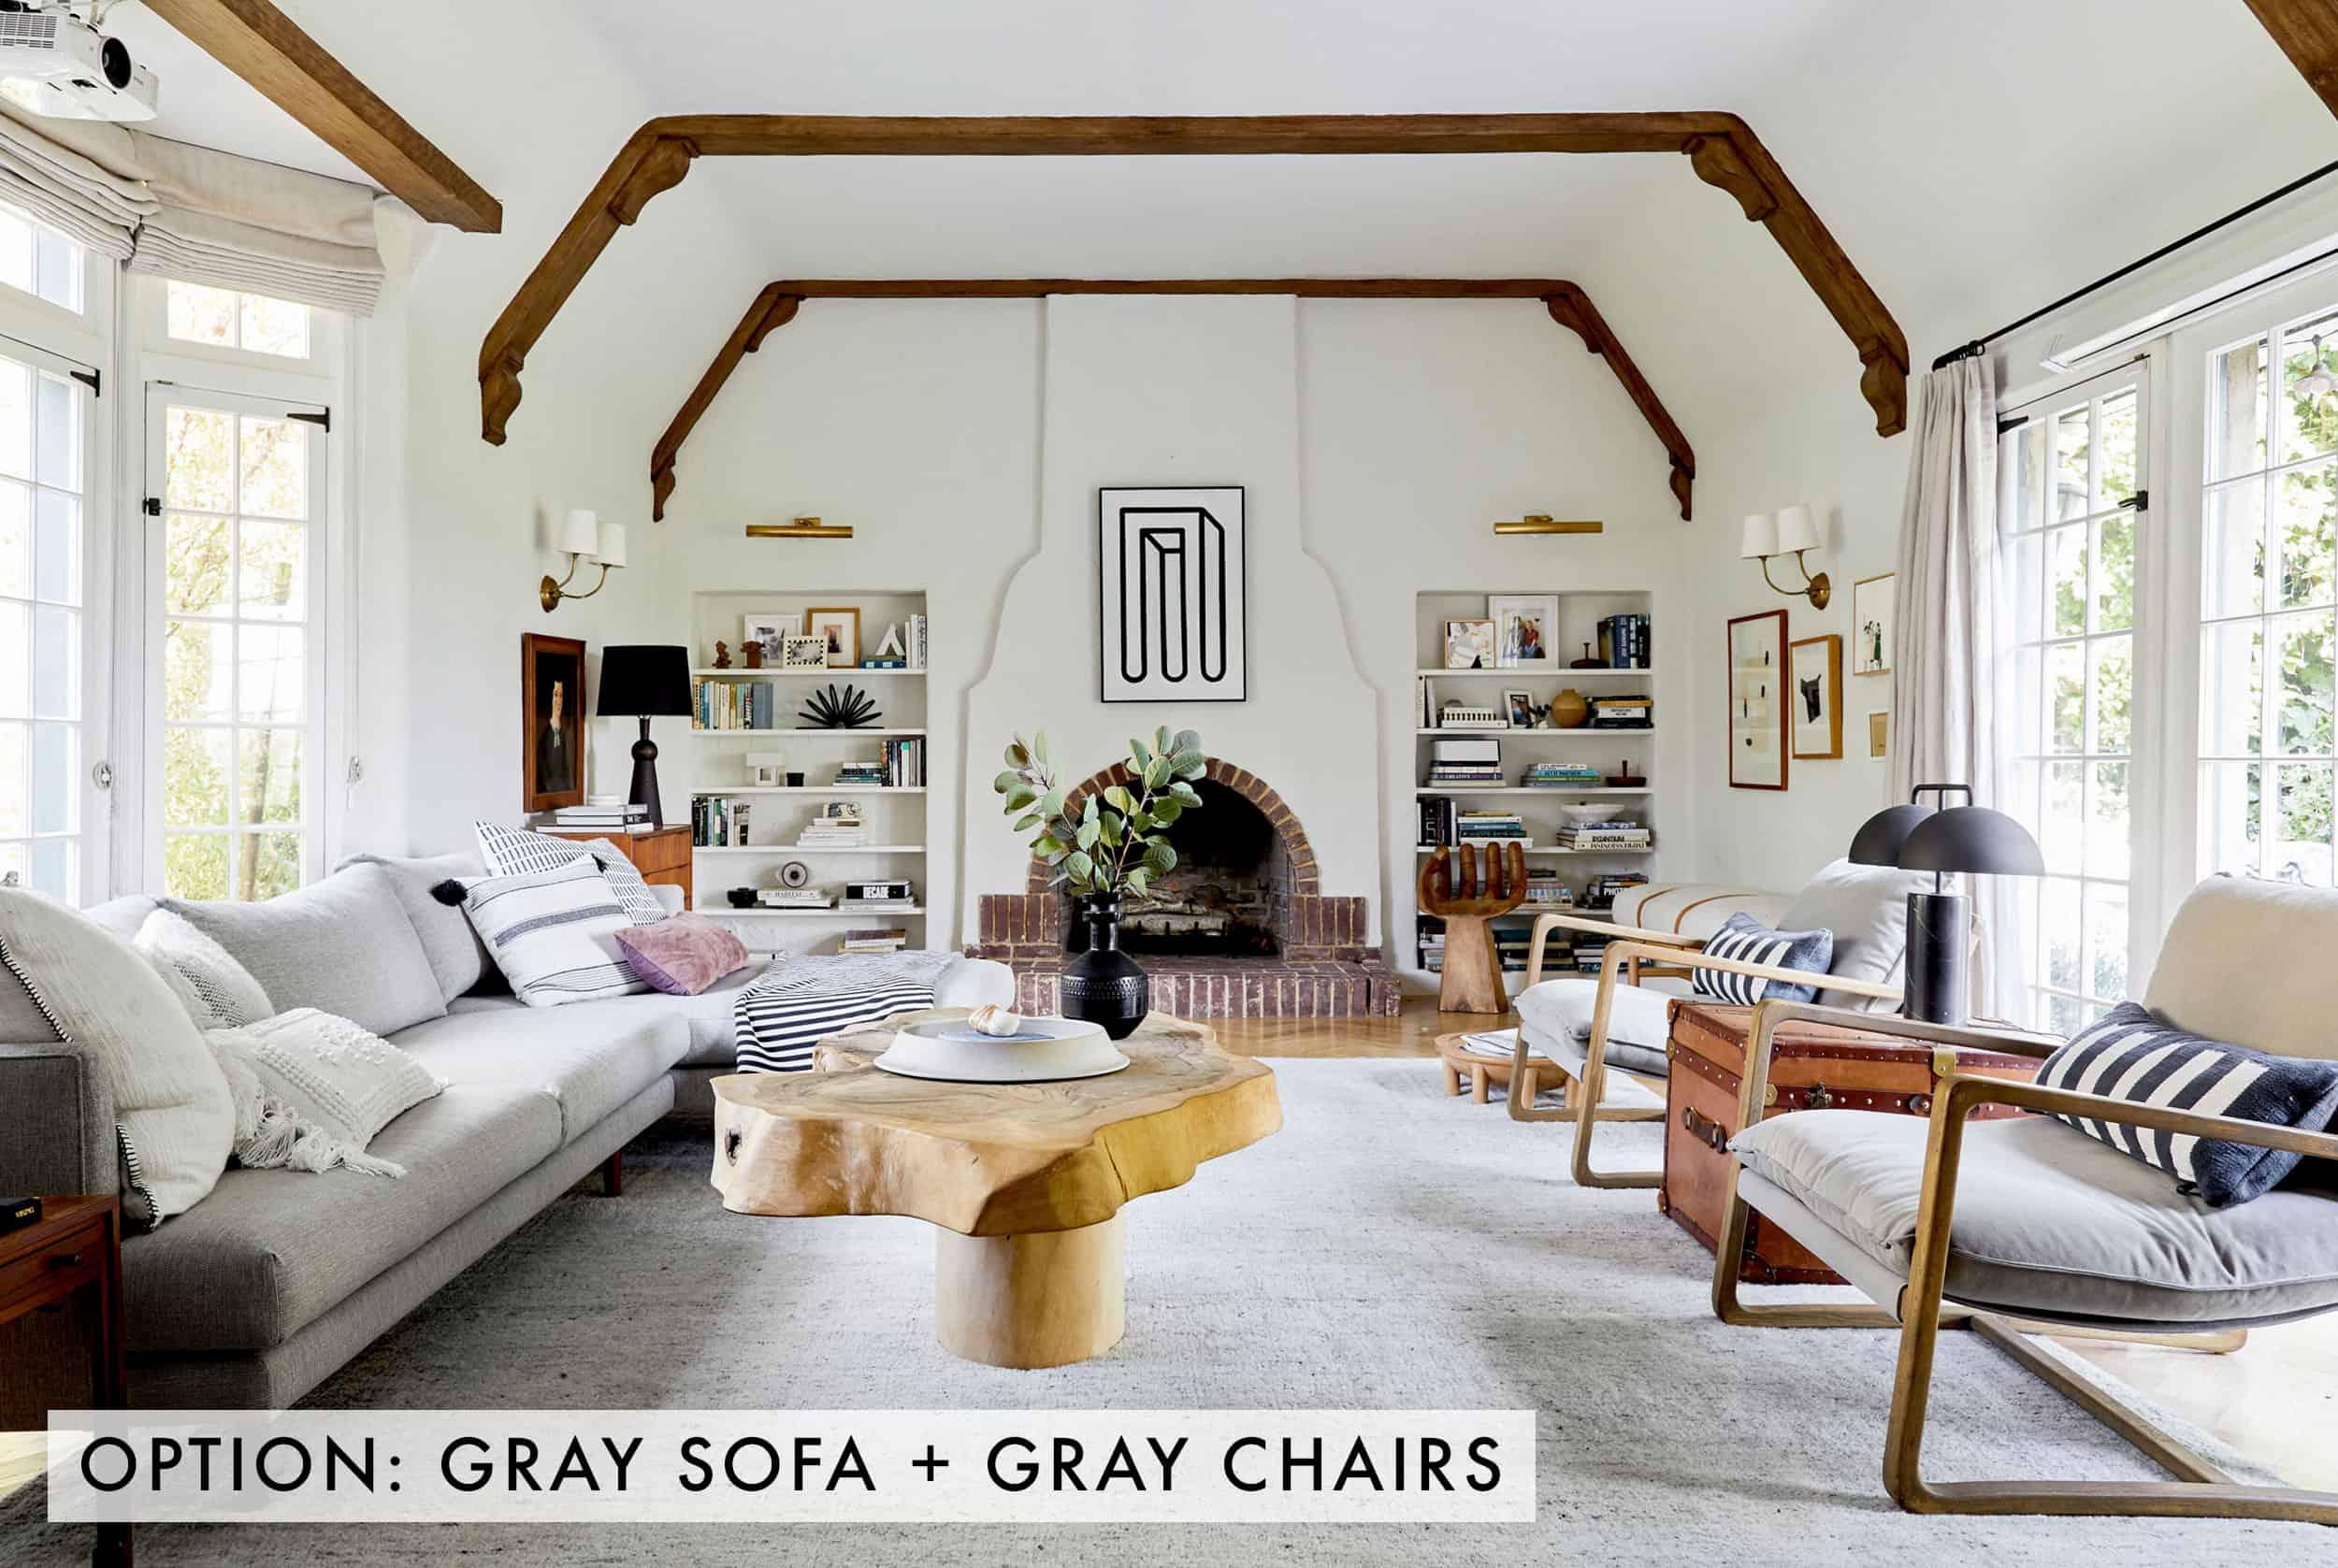 Gray Sofa + Gray Chairs